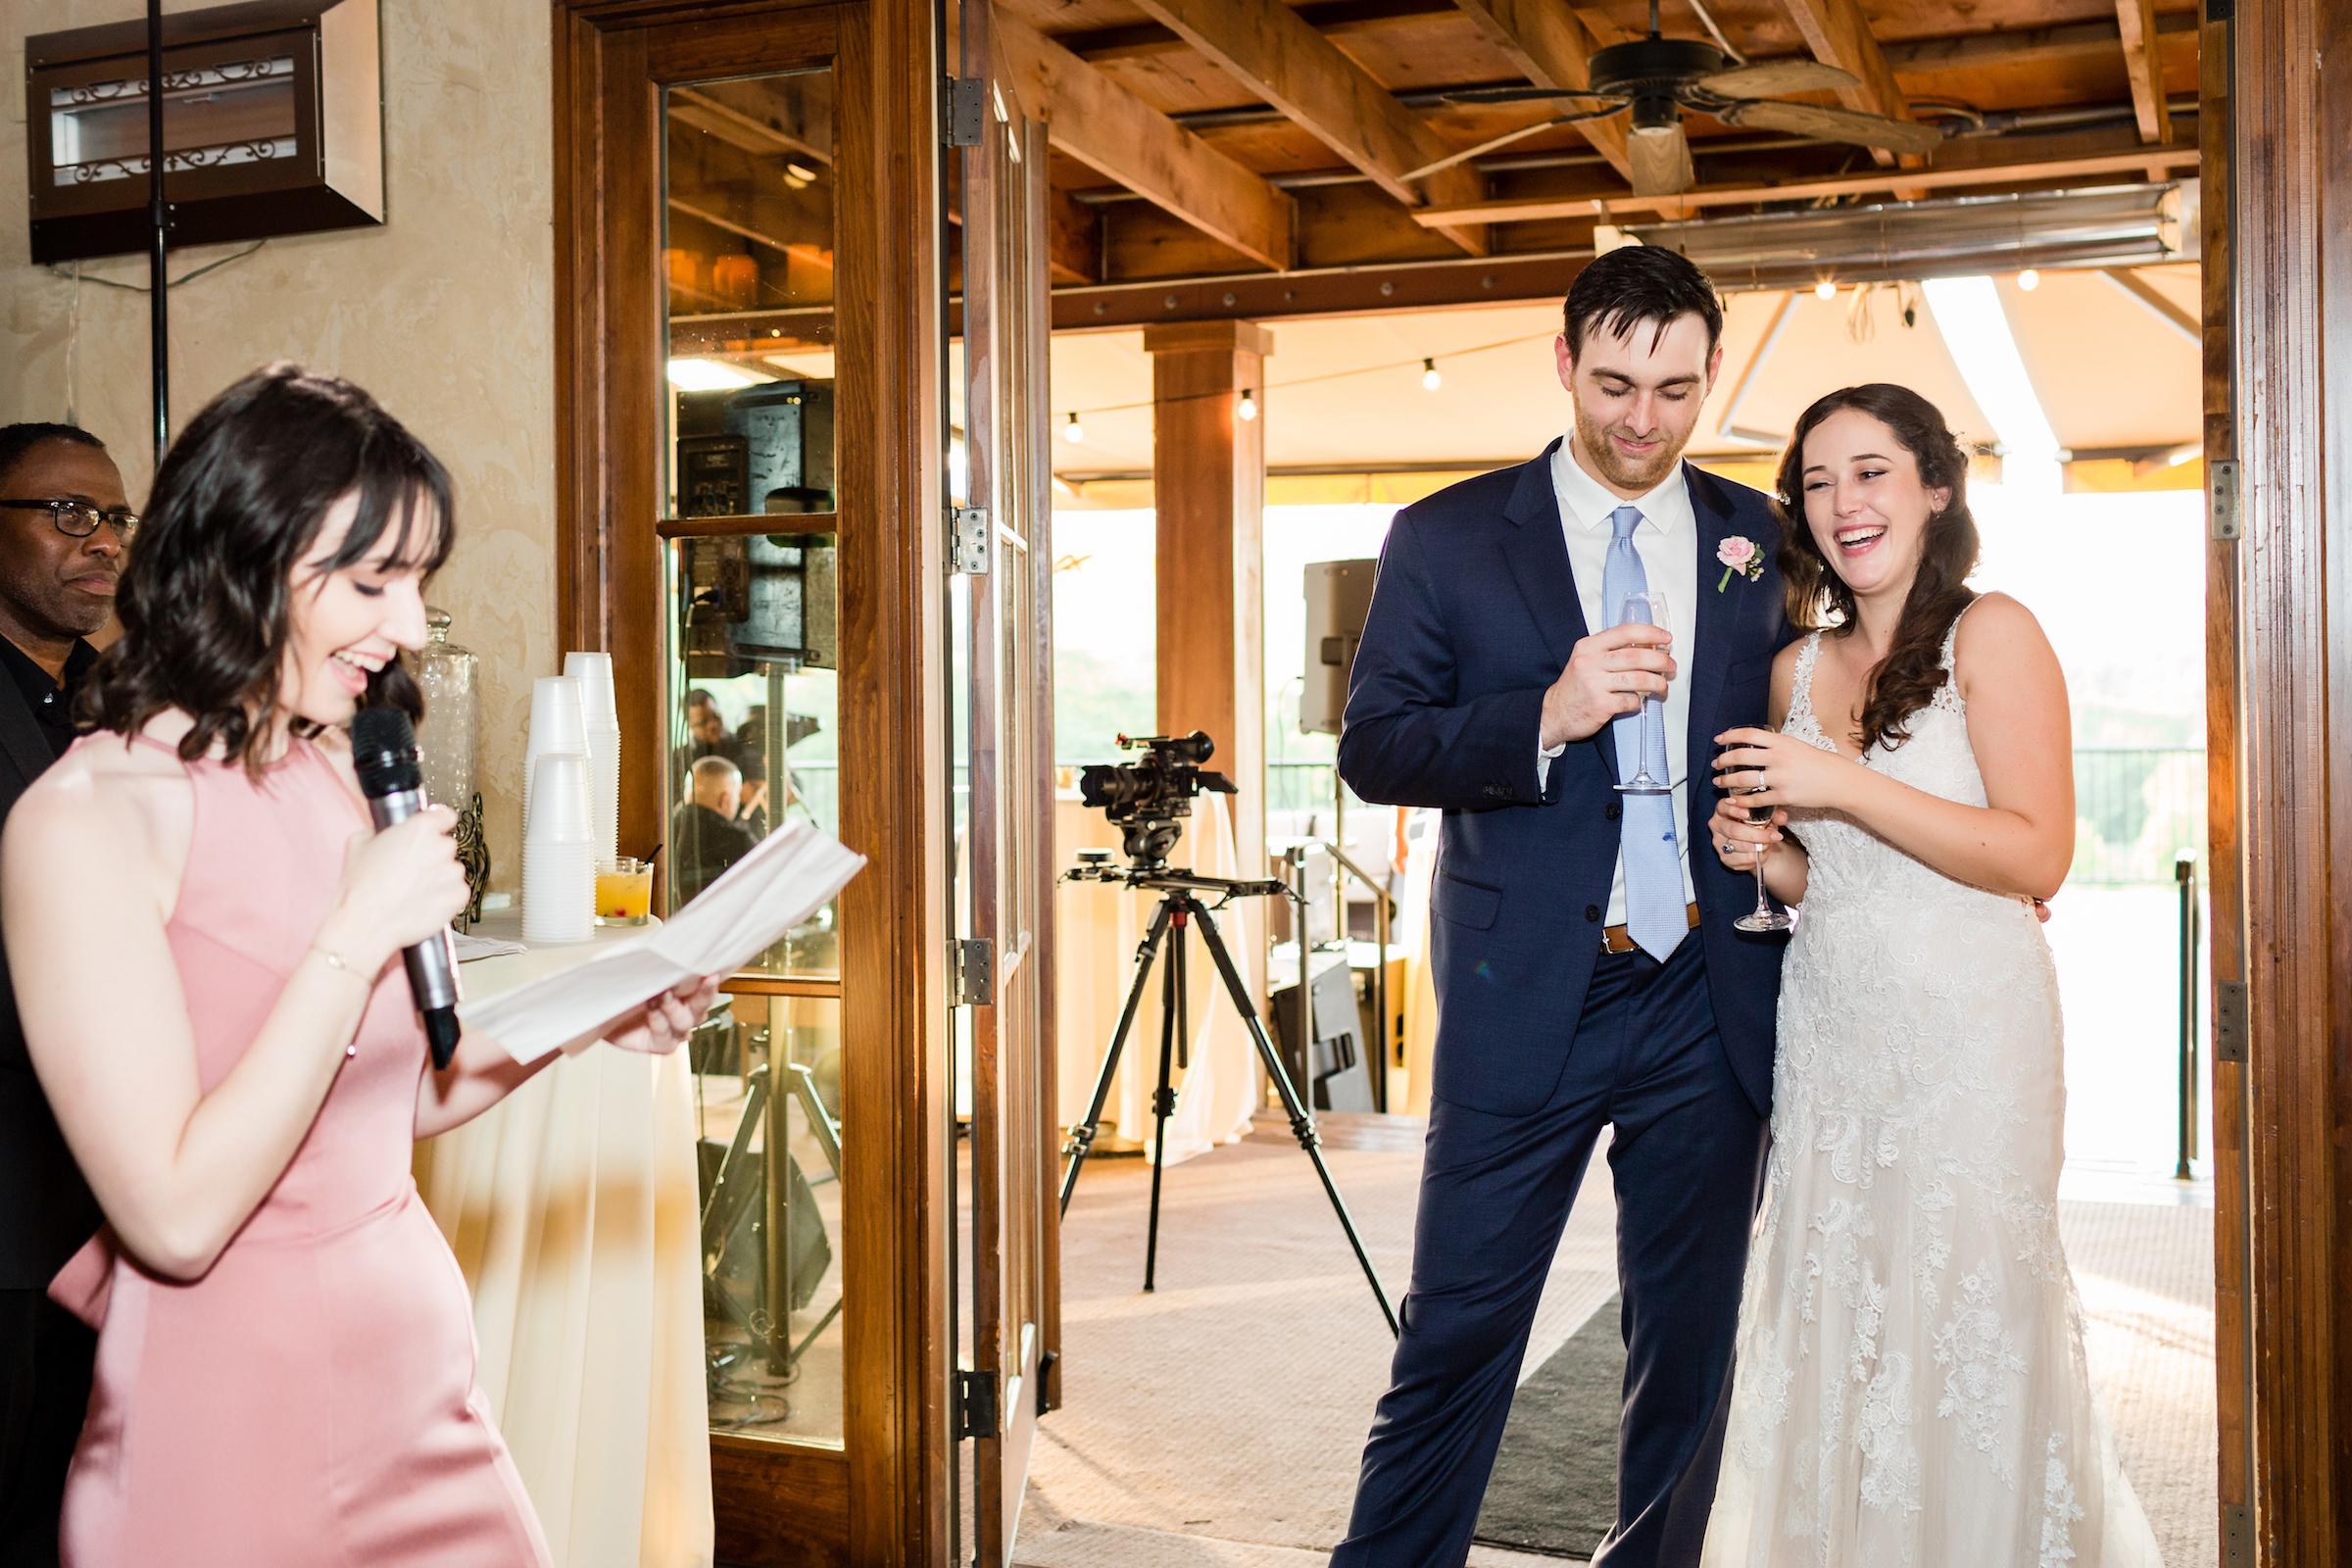 brielle-davis-events-kairos-photography-chandler-hill-wedding-reception-544.jpg